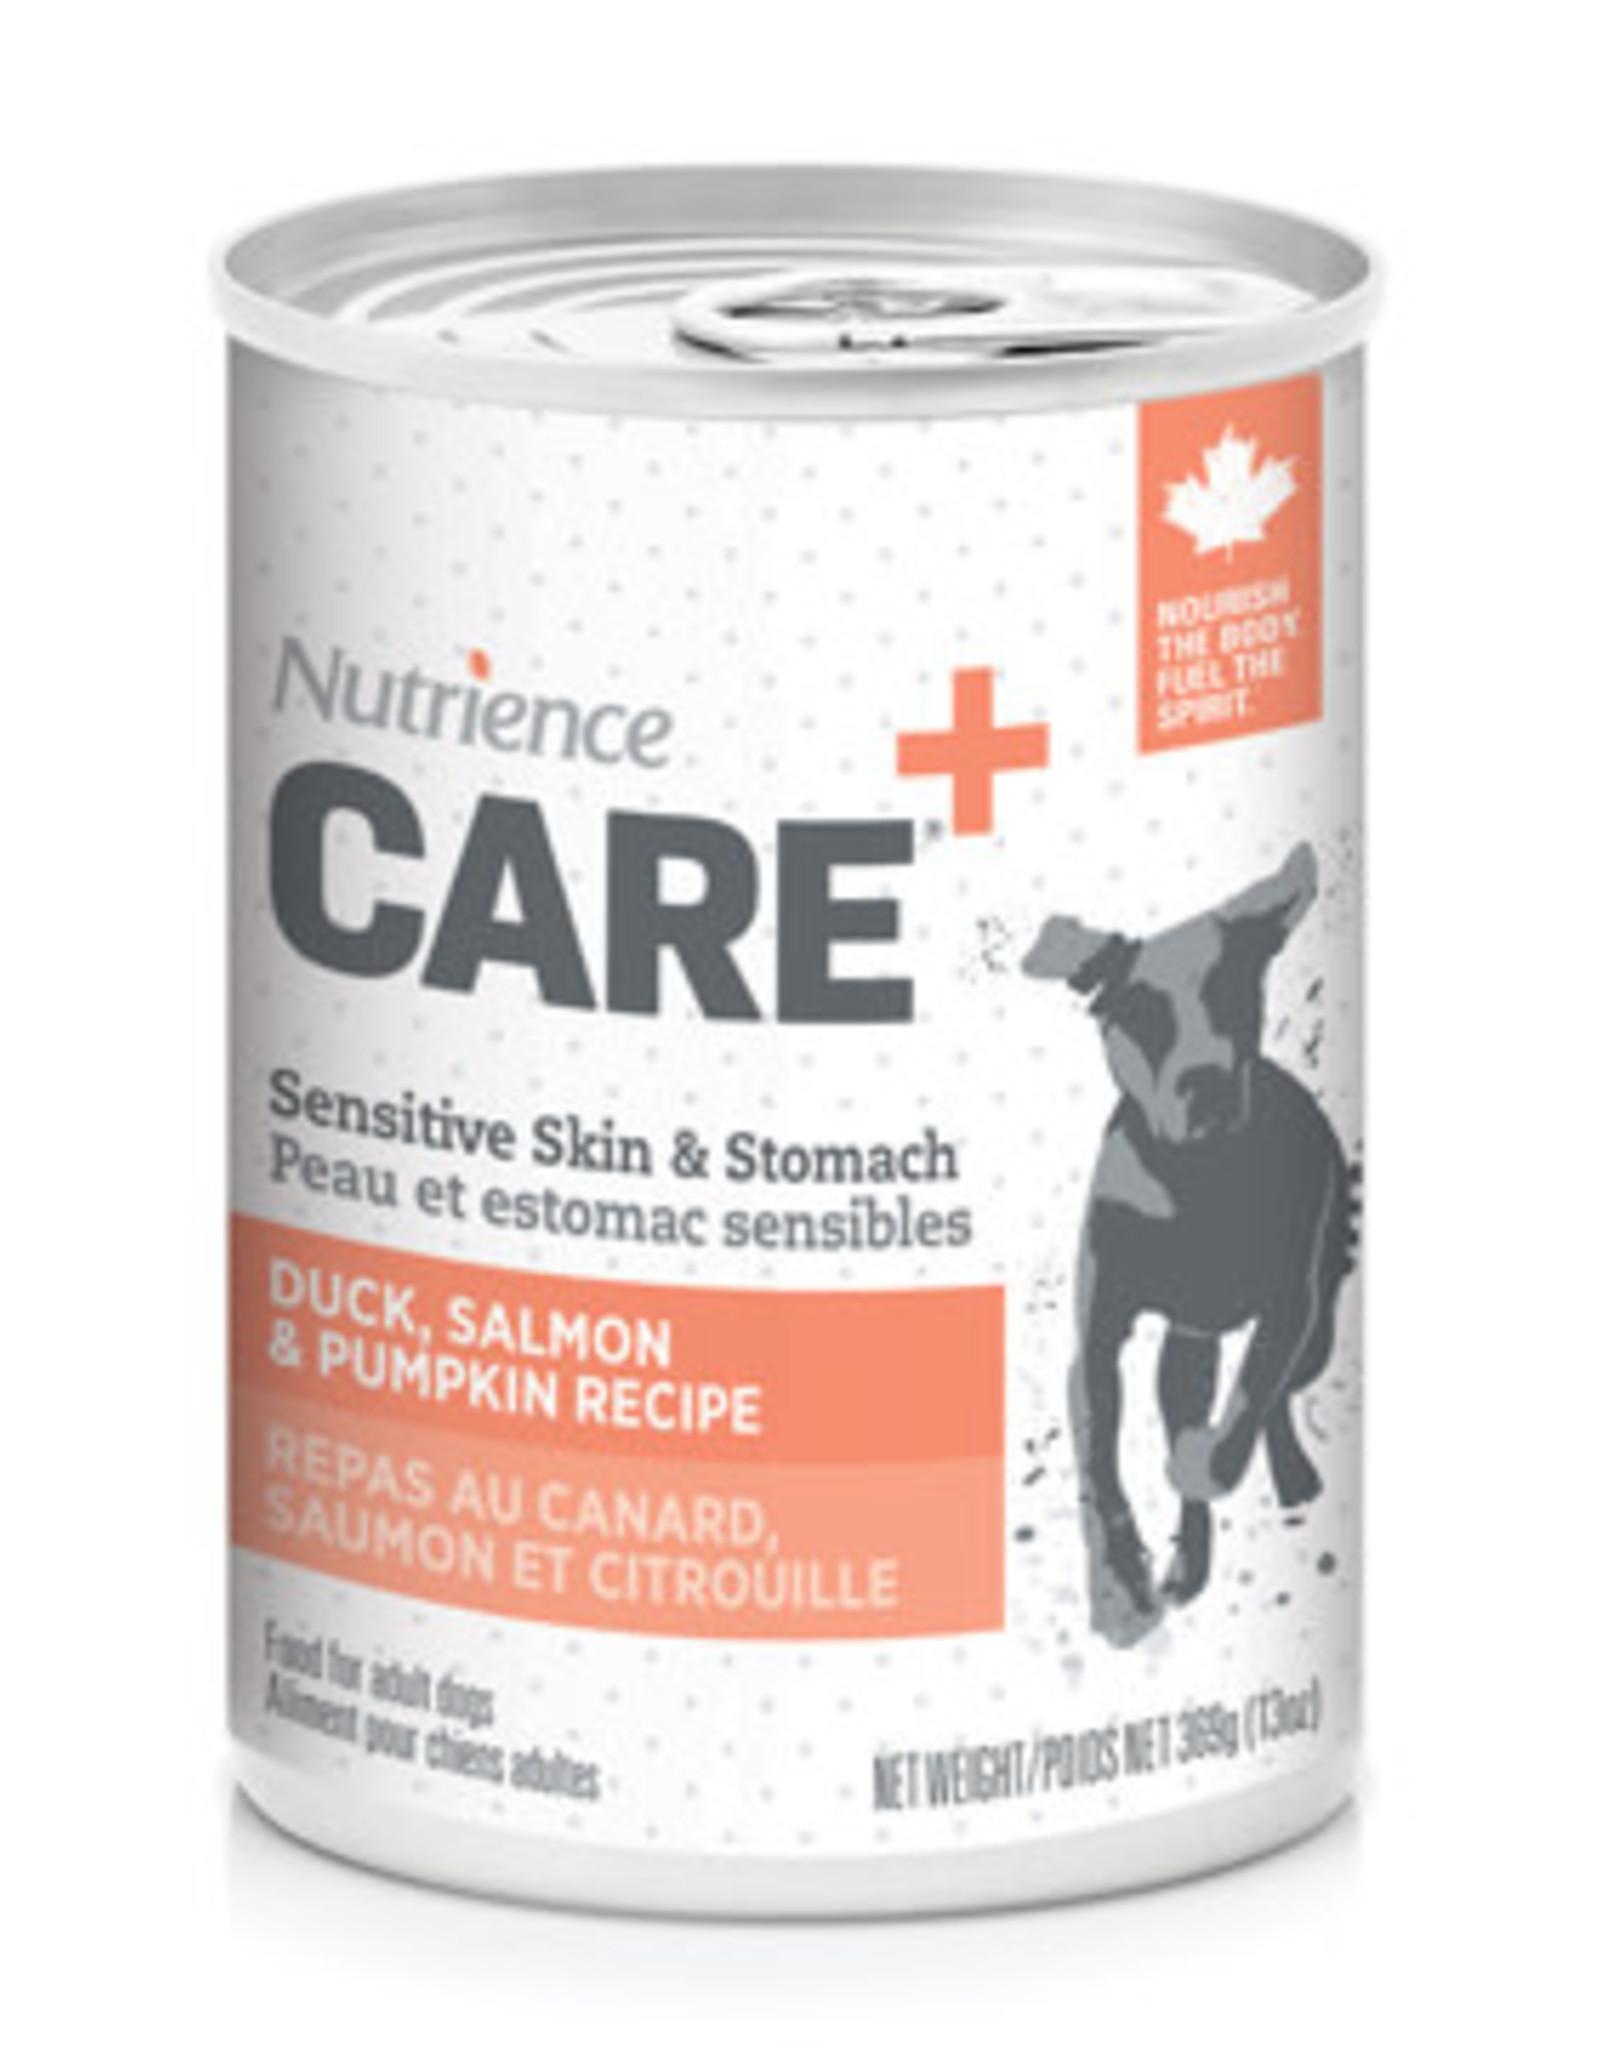 NUTRIENCE Nutrience Care Sensitive Skin & Stomach Pâté for Dogs - Duck, Salmon & Pumpkin Recipe - 369 g (13 oz)